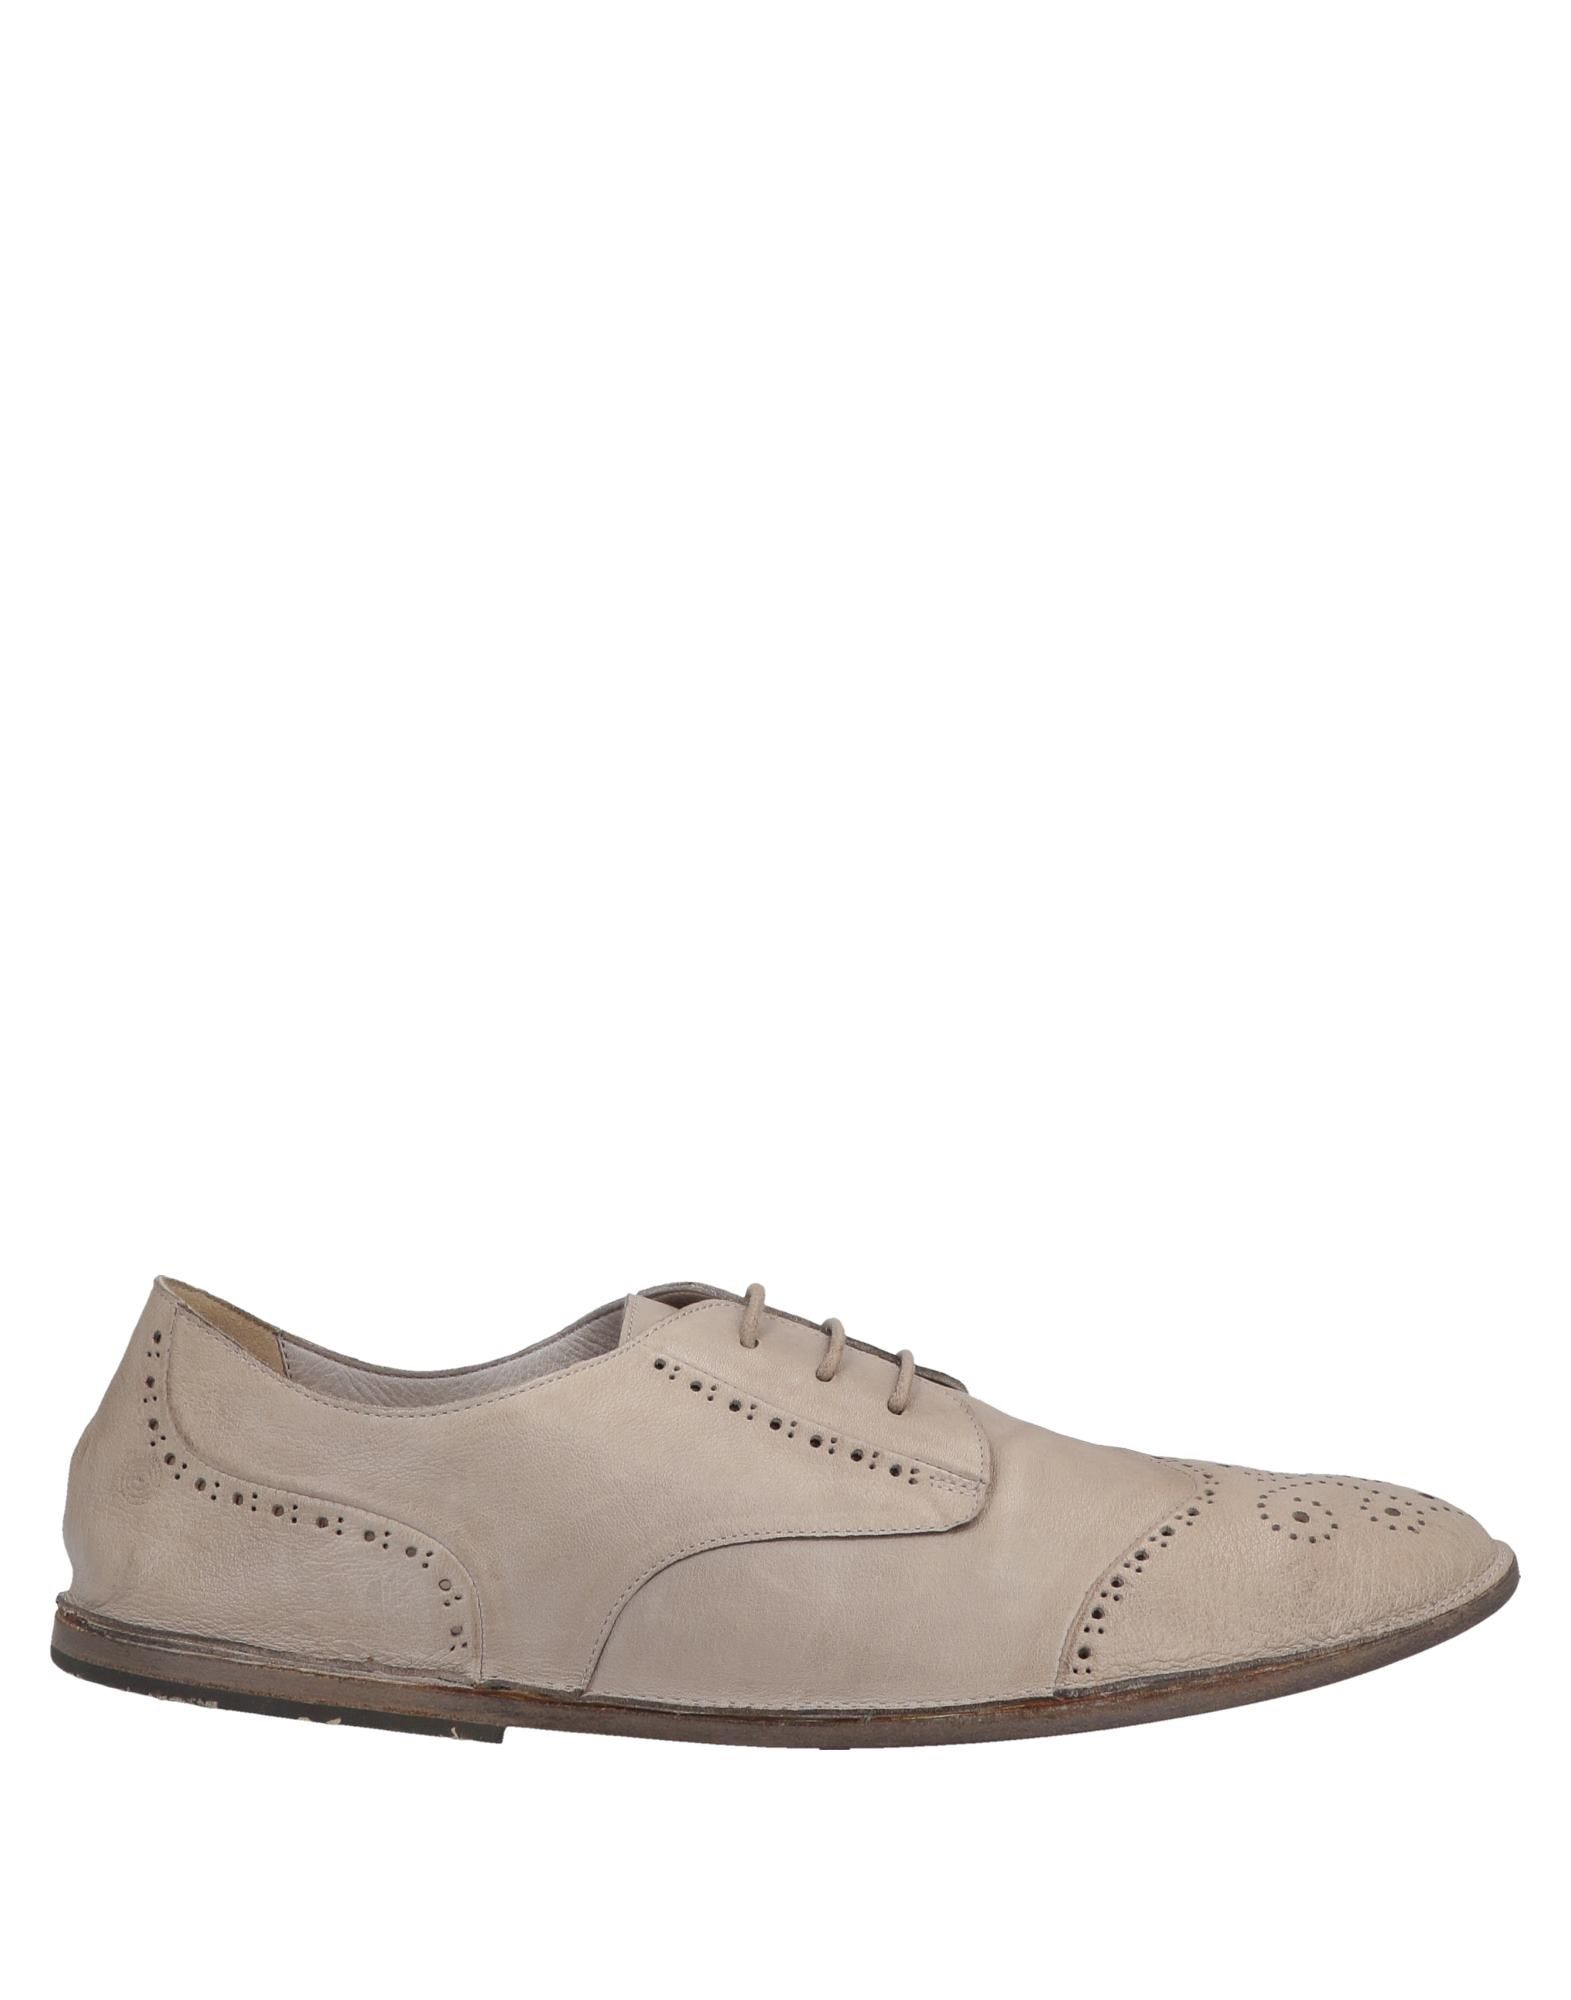 Фото - MARSÈLL Обувь на шнурках обувь на высокой платформе dkny